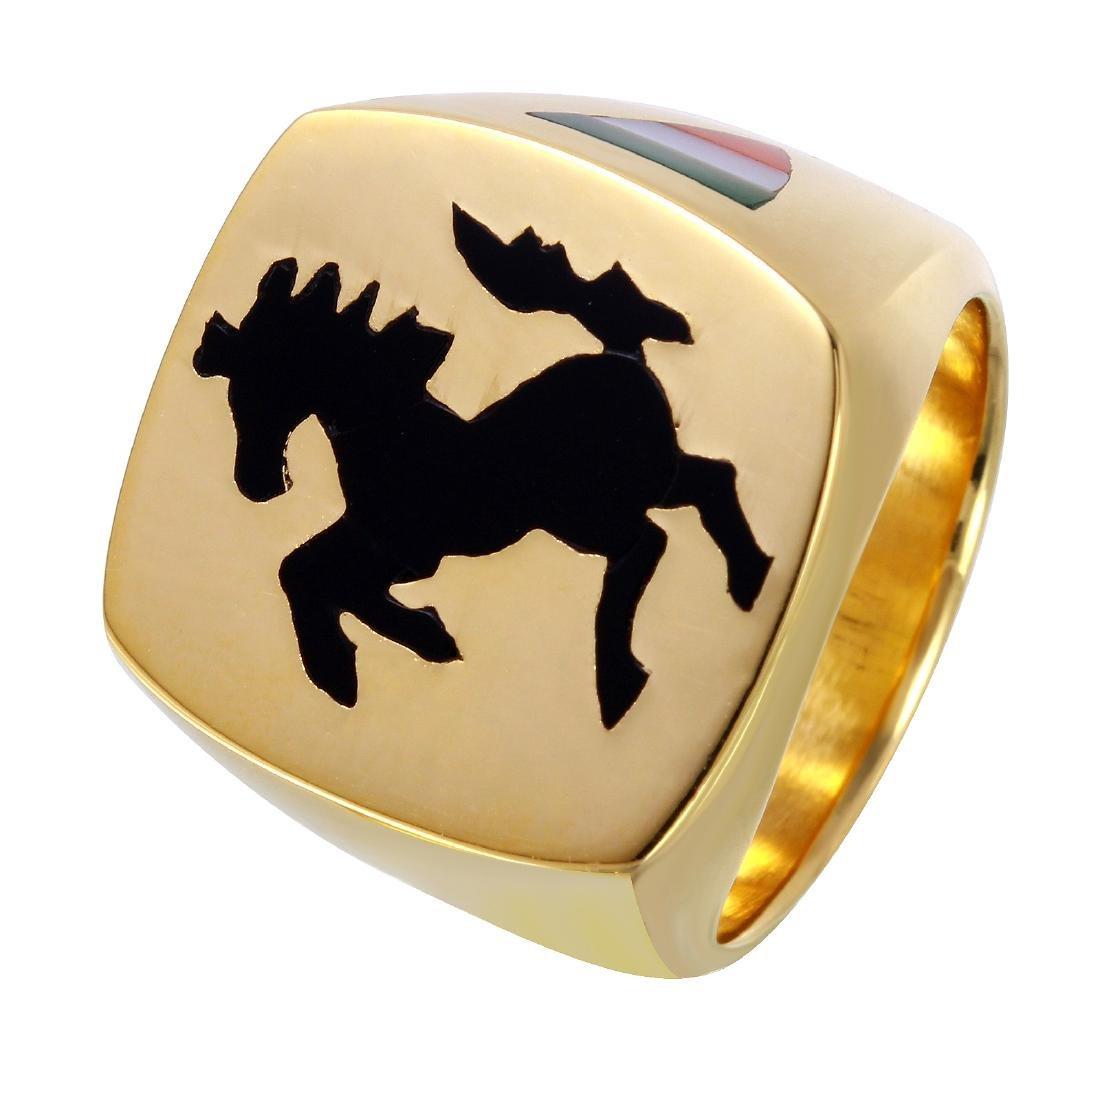 Gent's Ferrari Design 18KT Yellow Gold  Ring